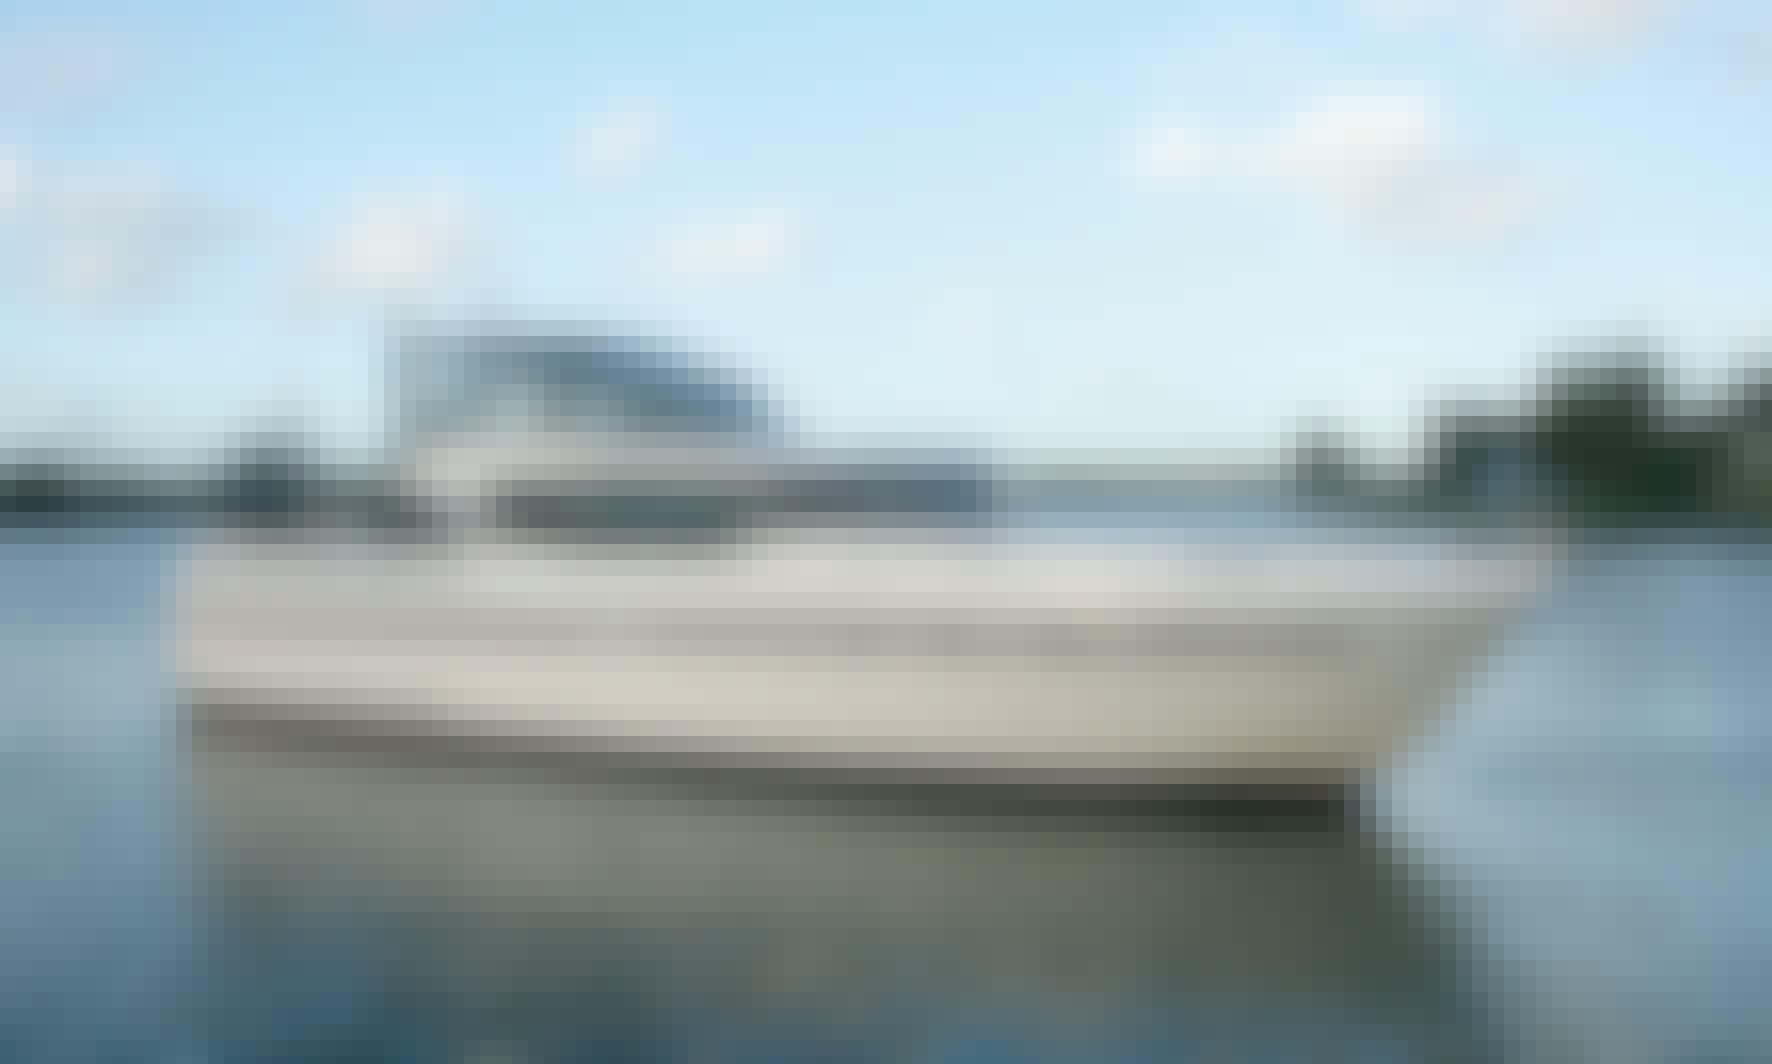 48' Tyvano 1450 Motor Yacht Charter in Drachten - Friesland, Netherlands